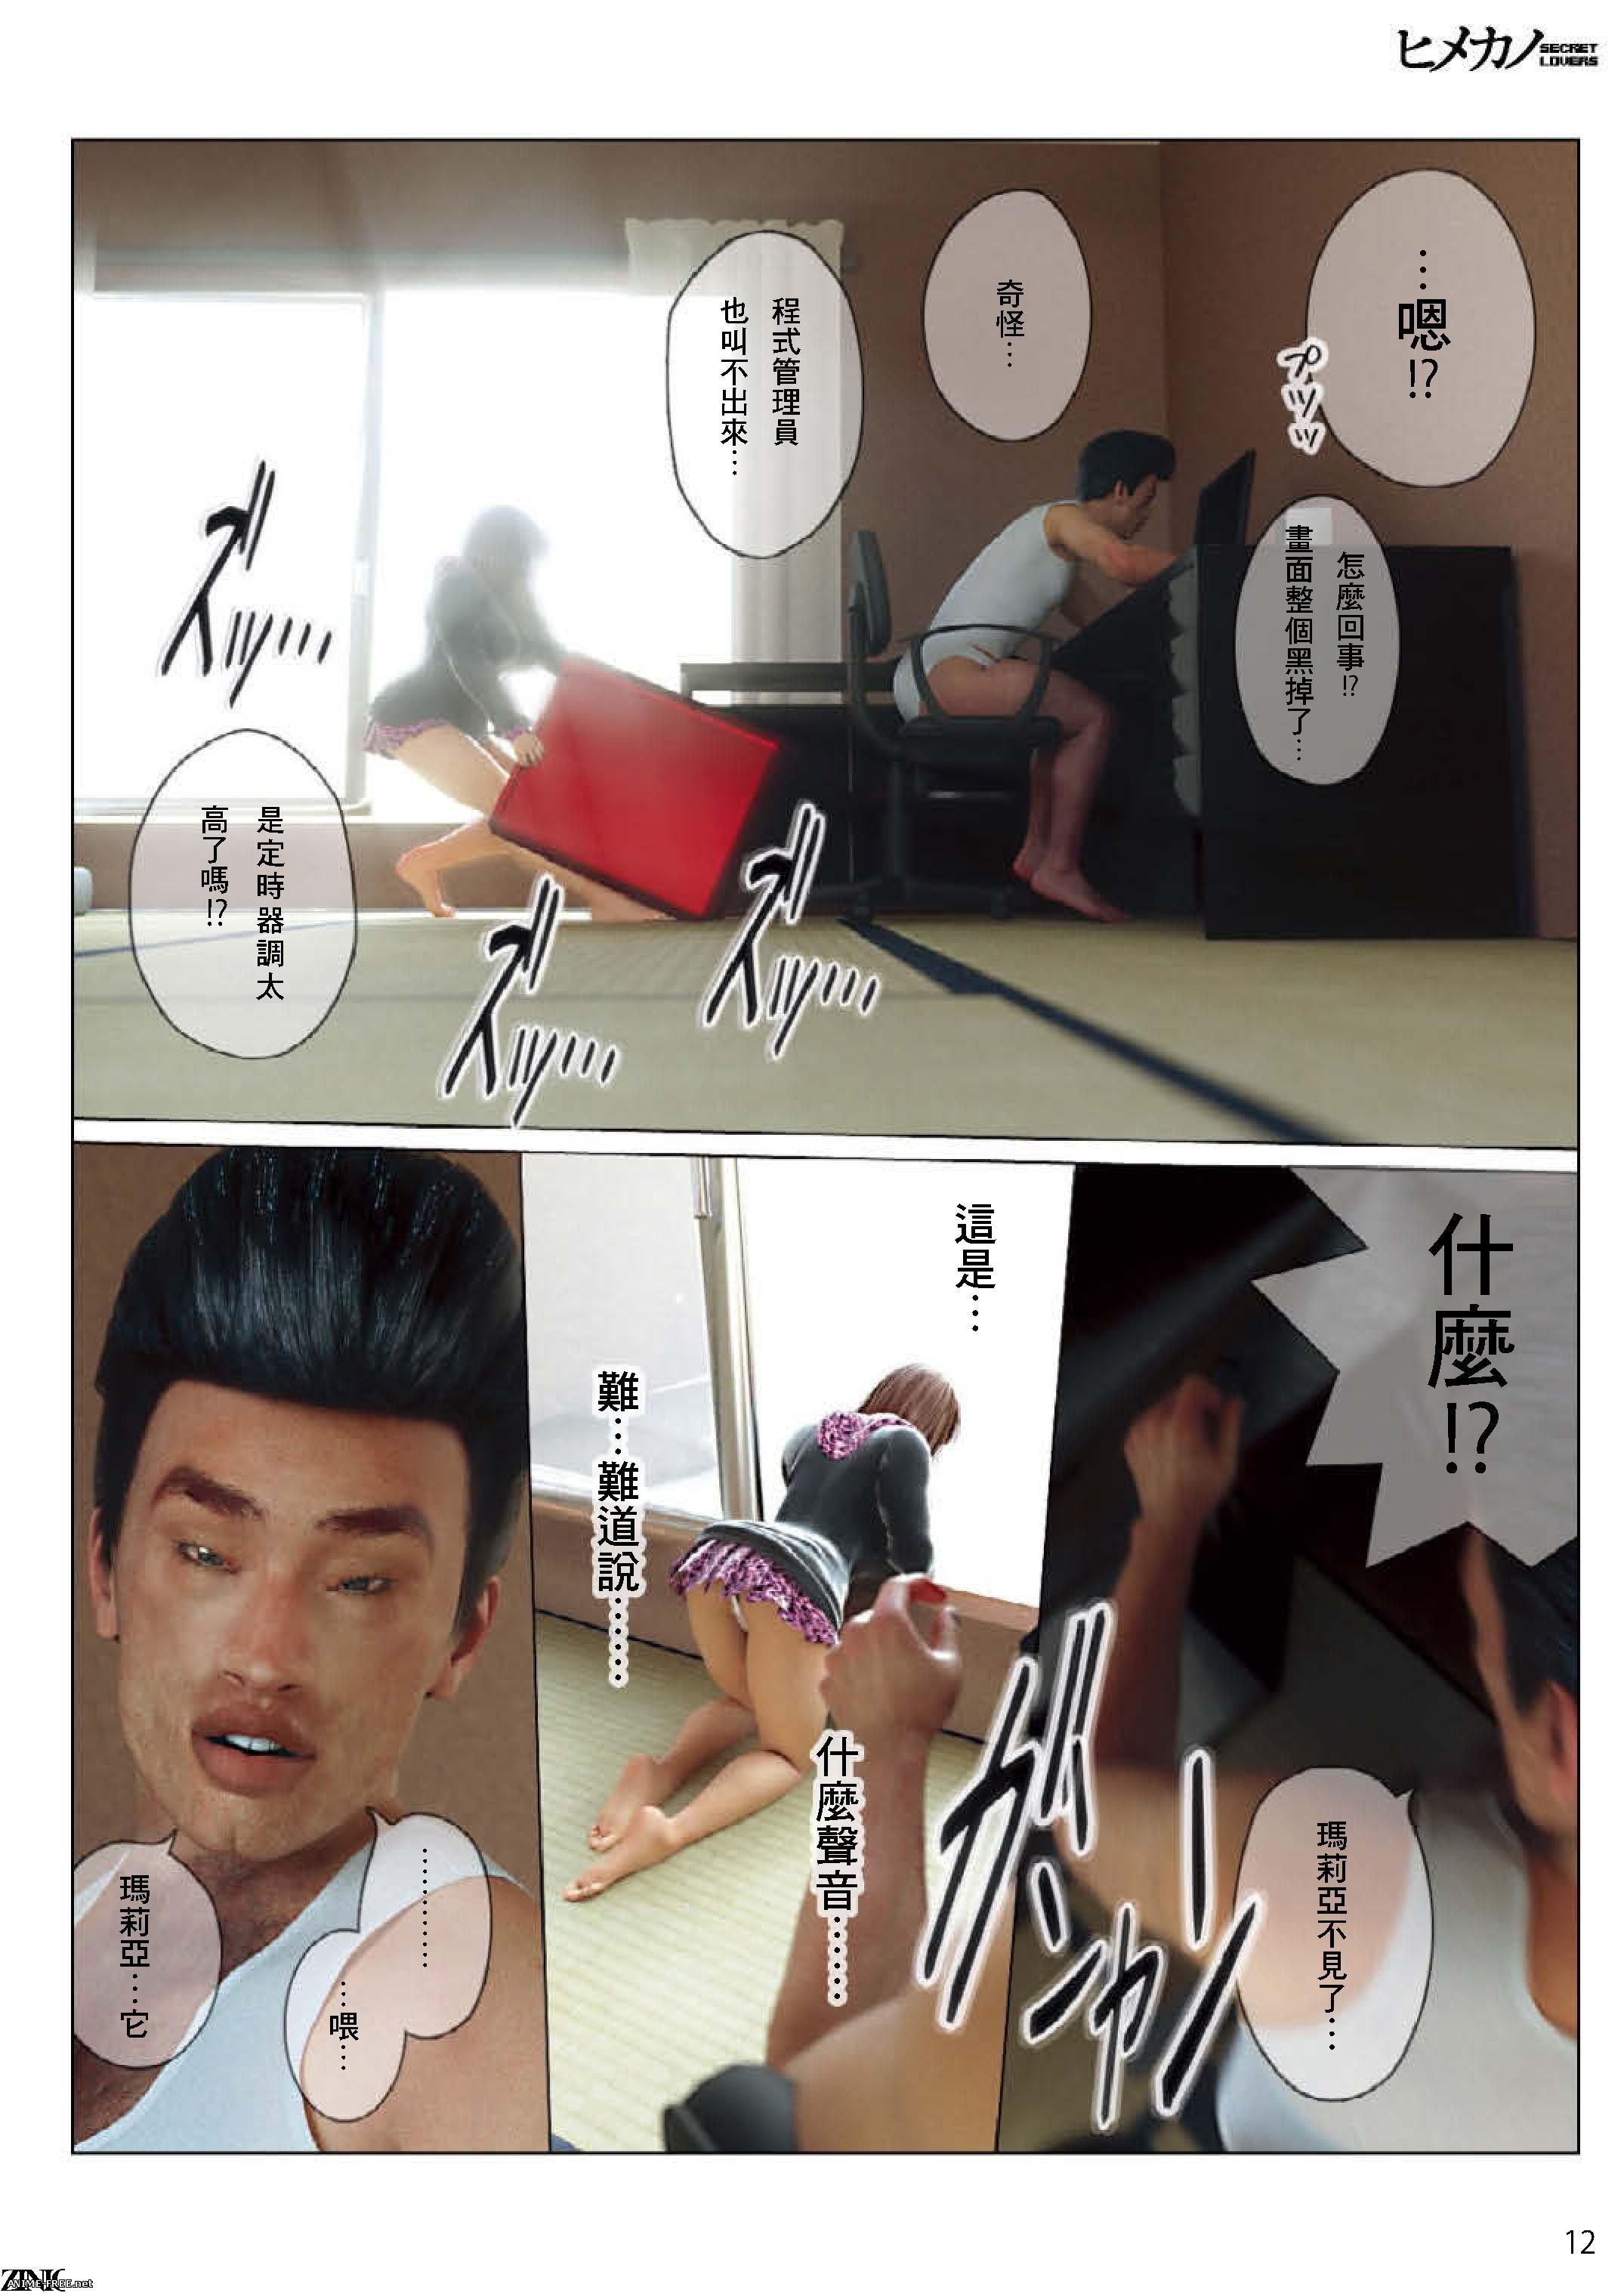 IWIN Hentai Comic - Issue 1-3 [Сen] [3DCG] [PDF] Porno Comics